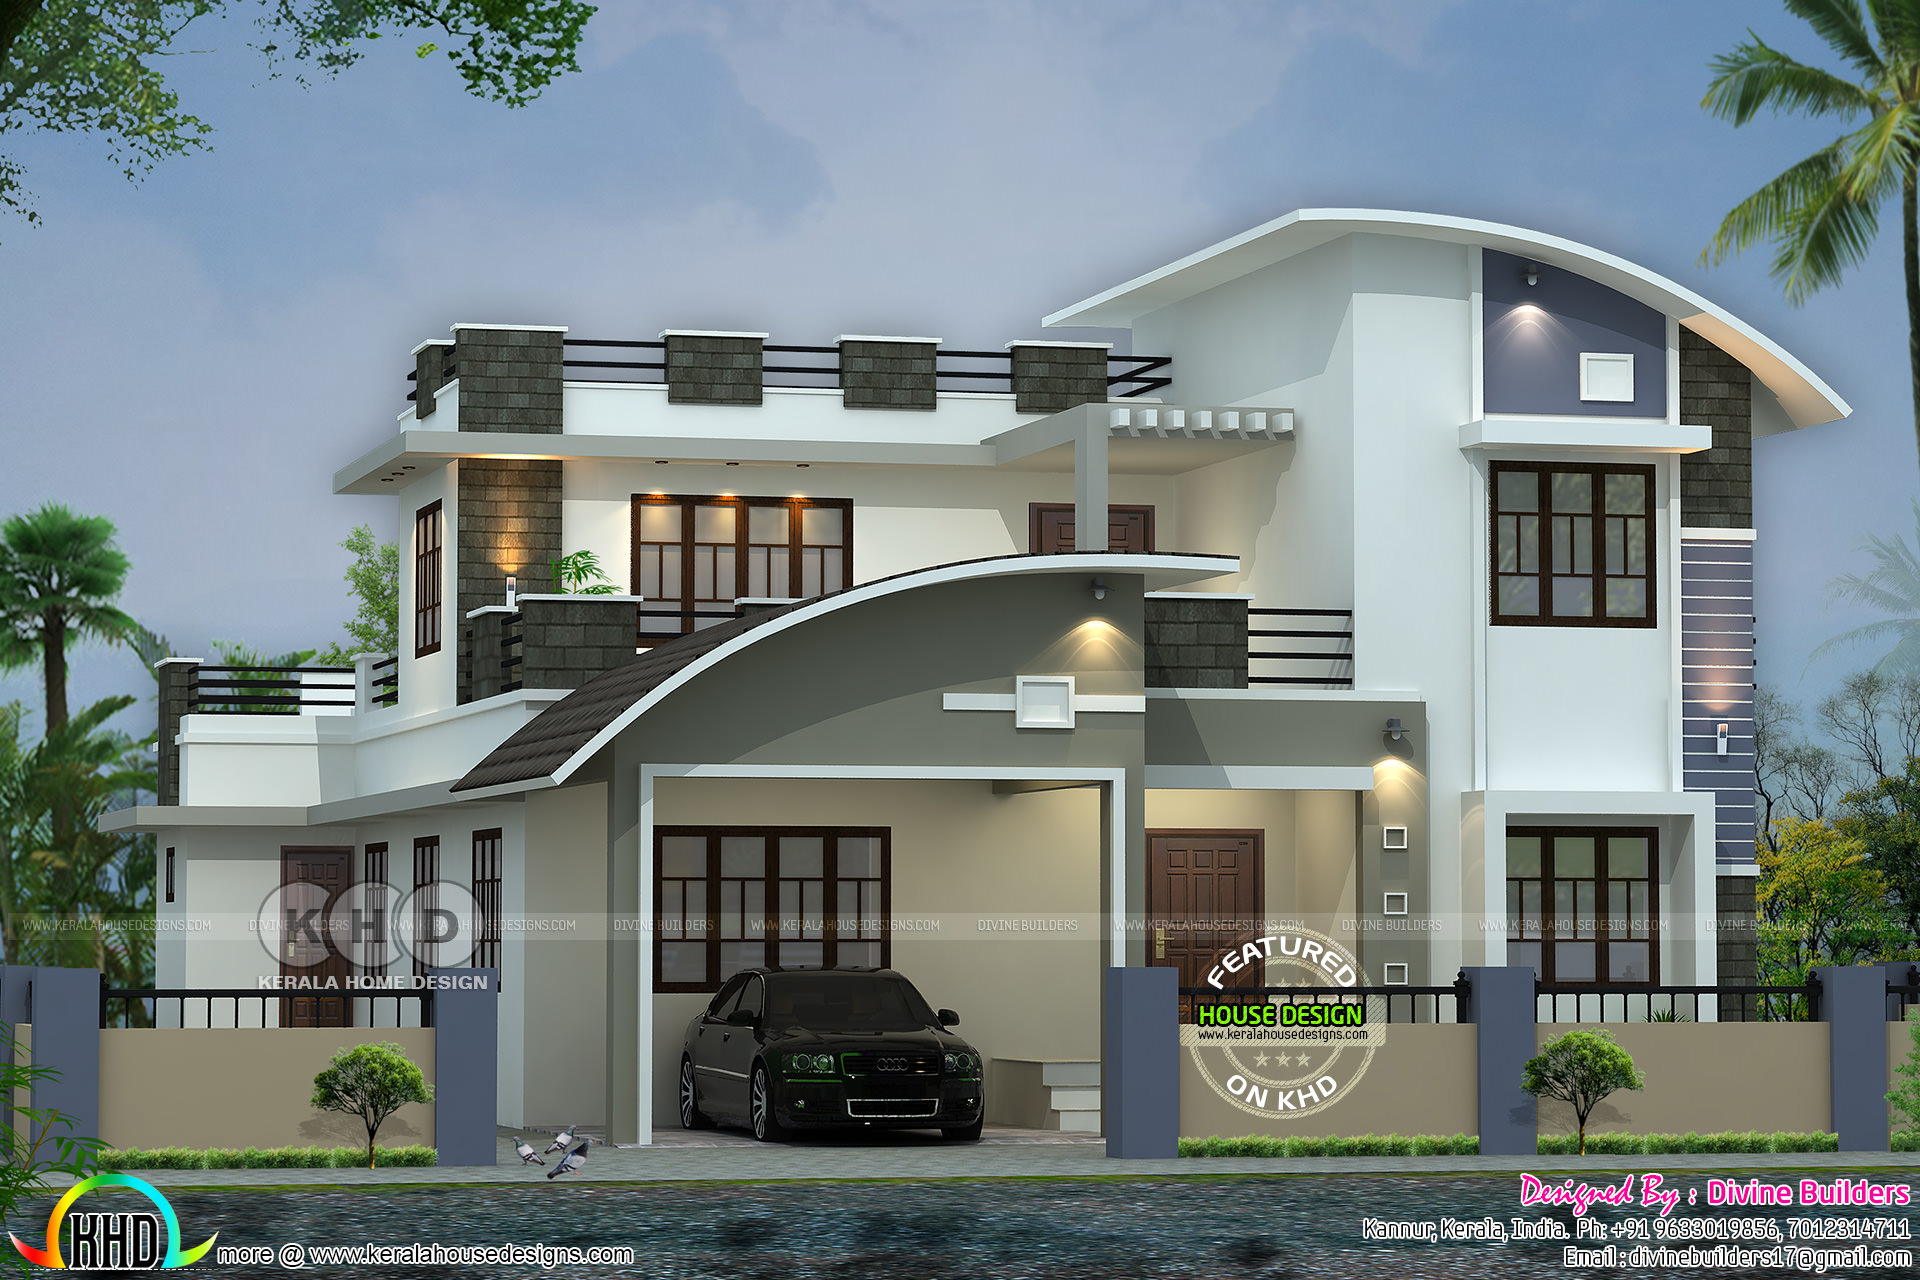 2870 Square Feet Modern Mix Home ₹52 Lakhs